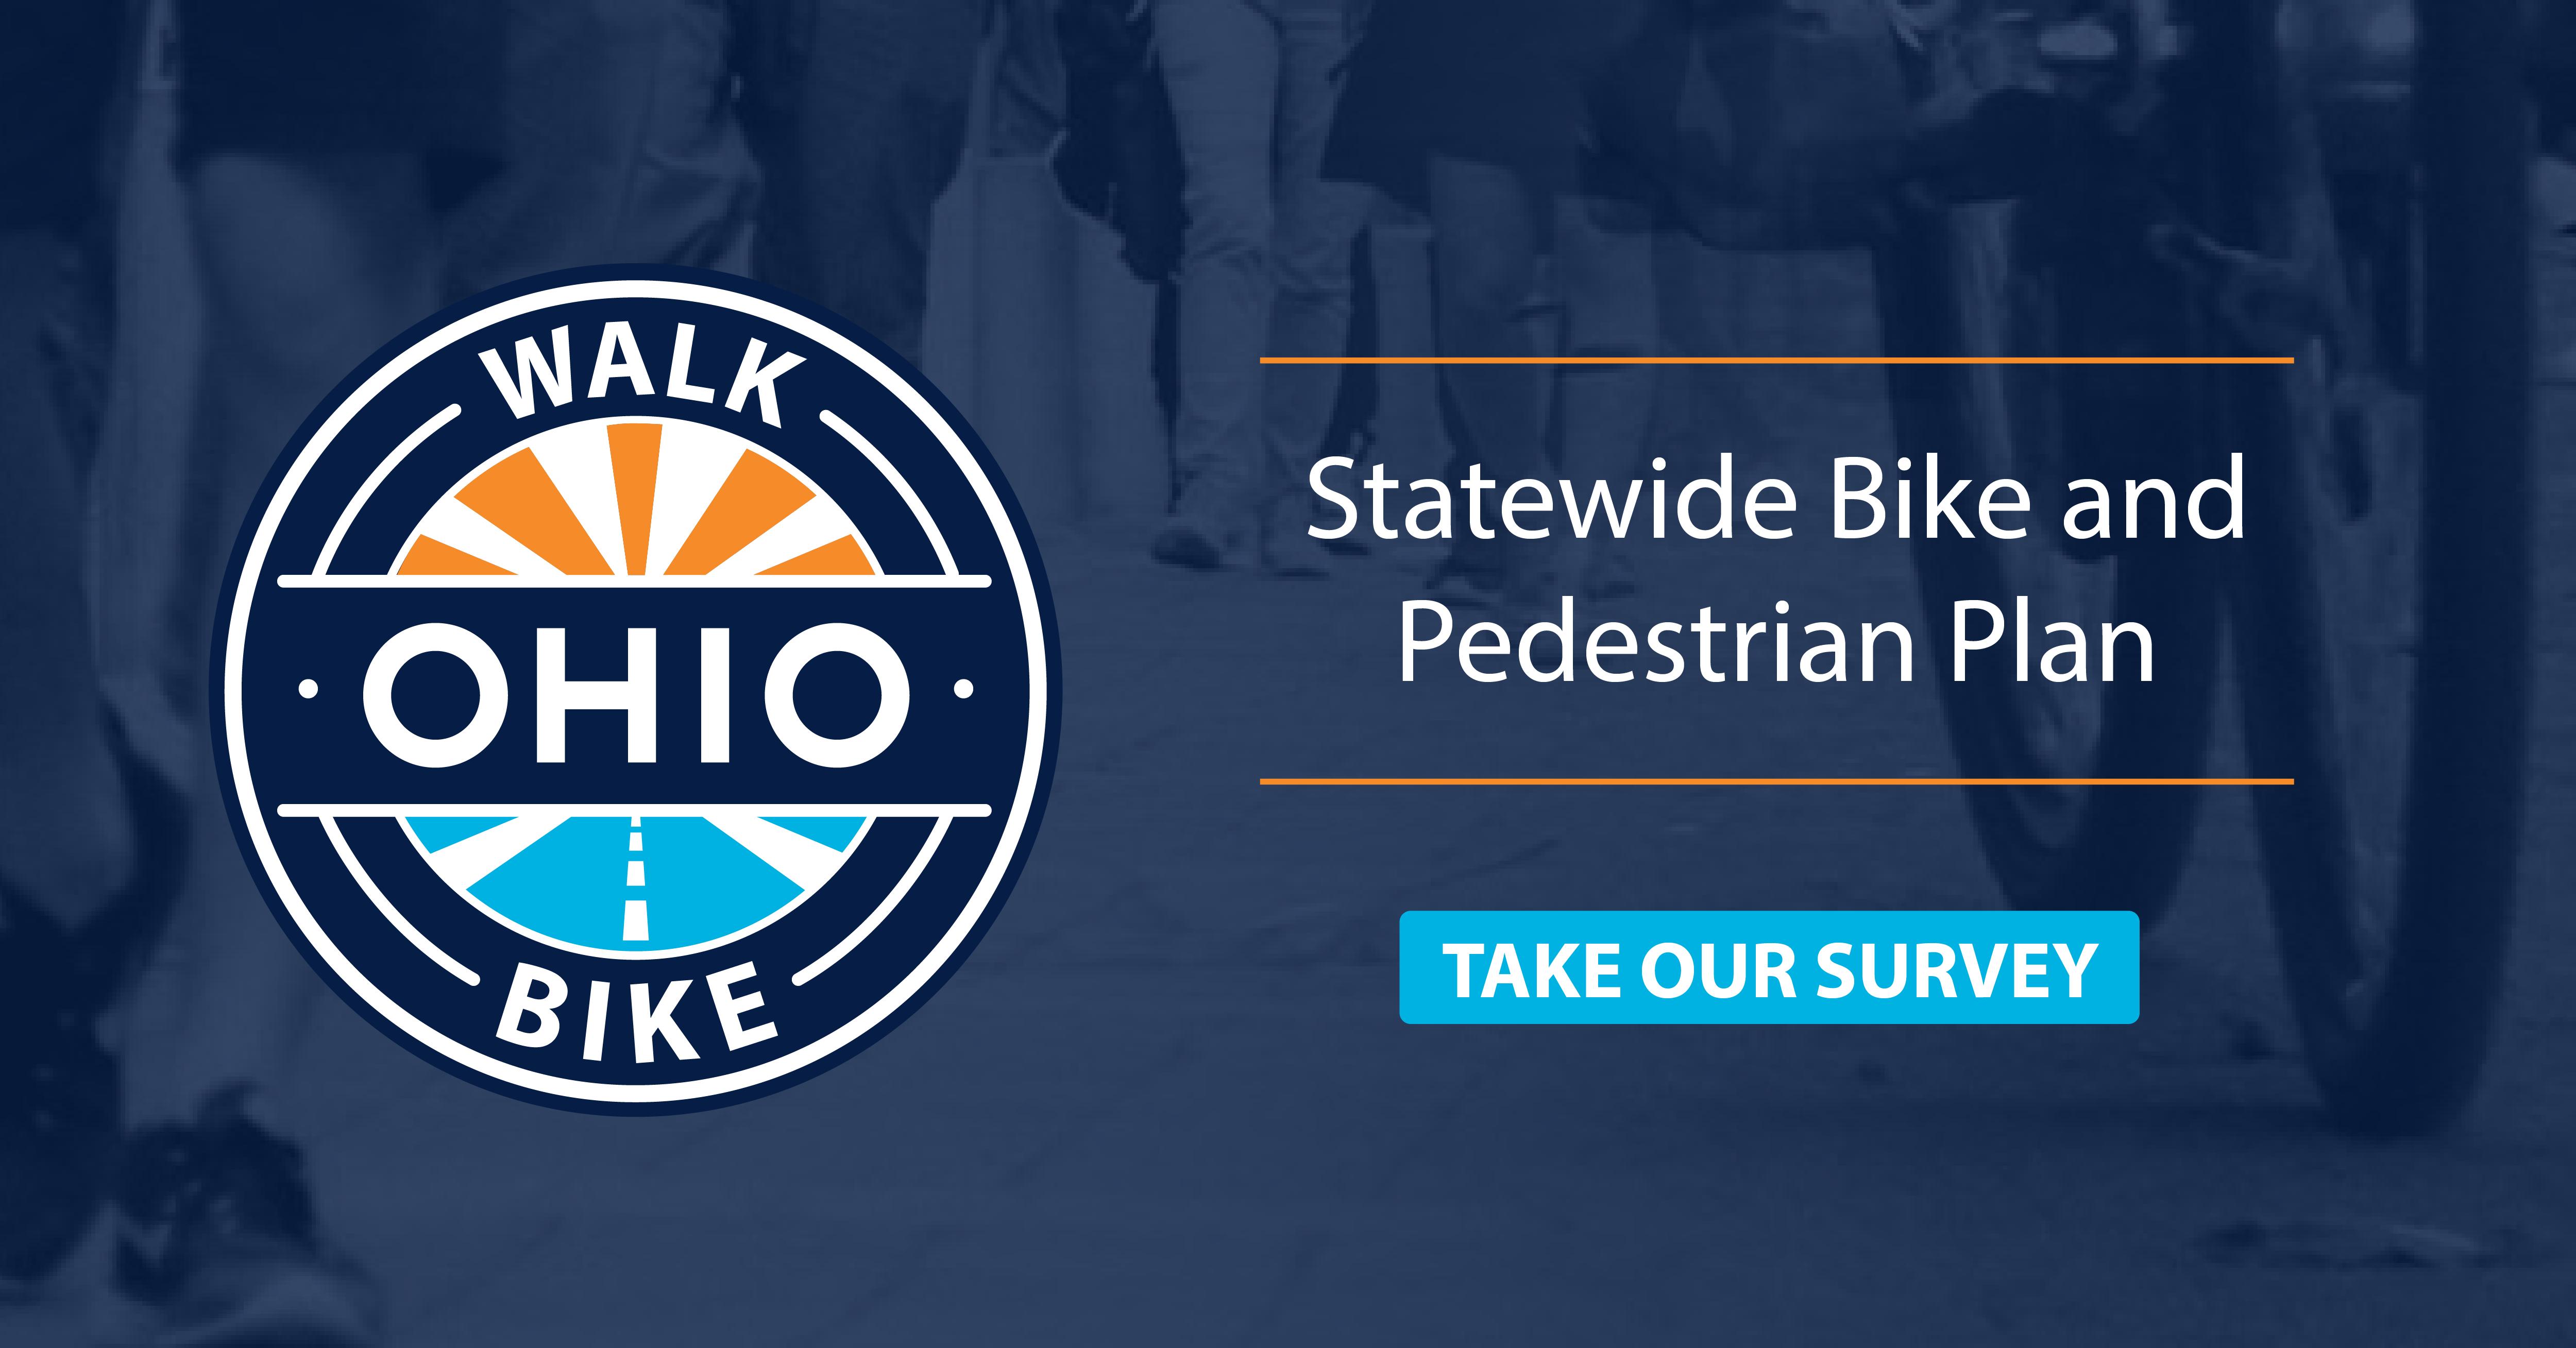 ODOT Walk.Bike.Ohio Plan